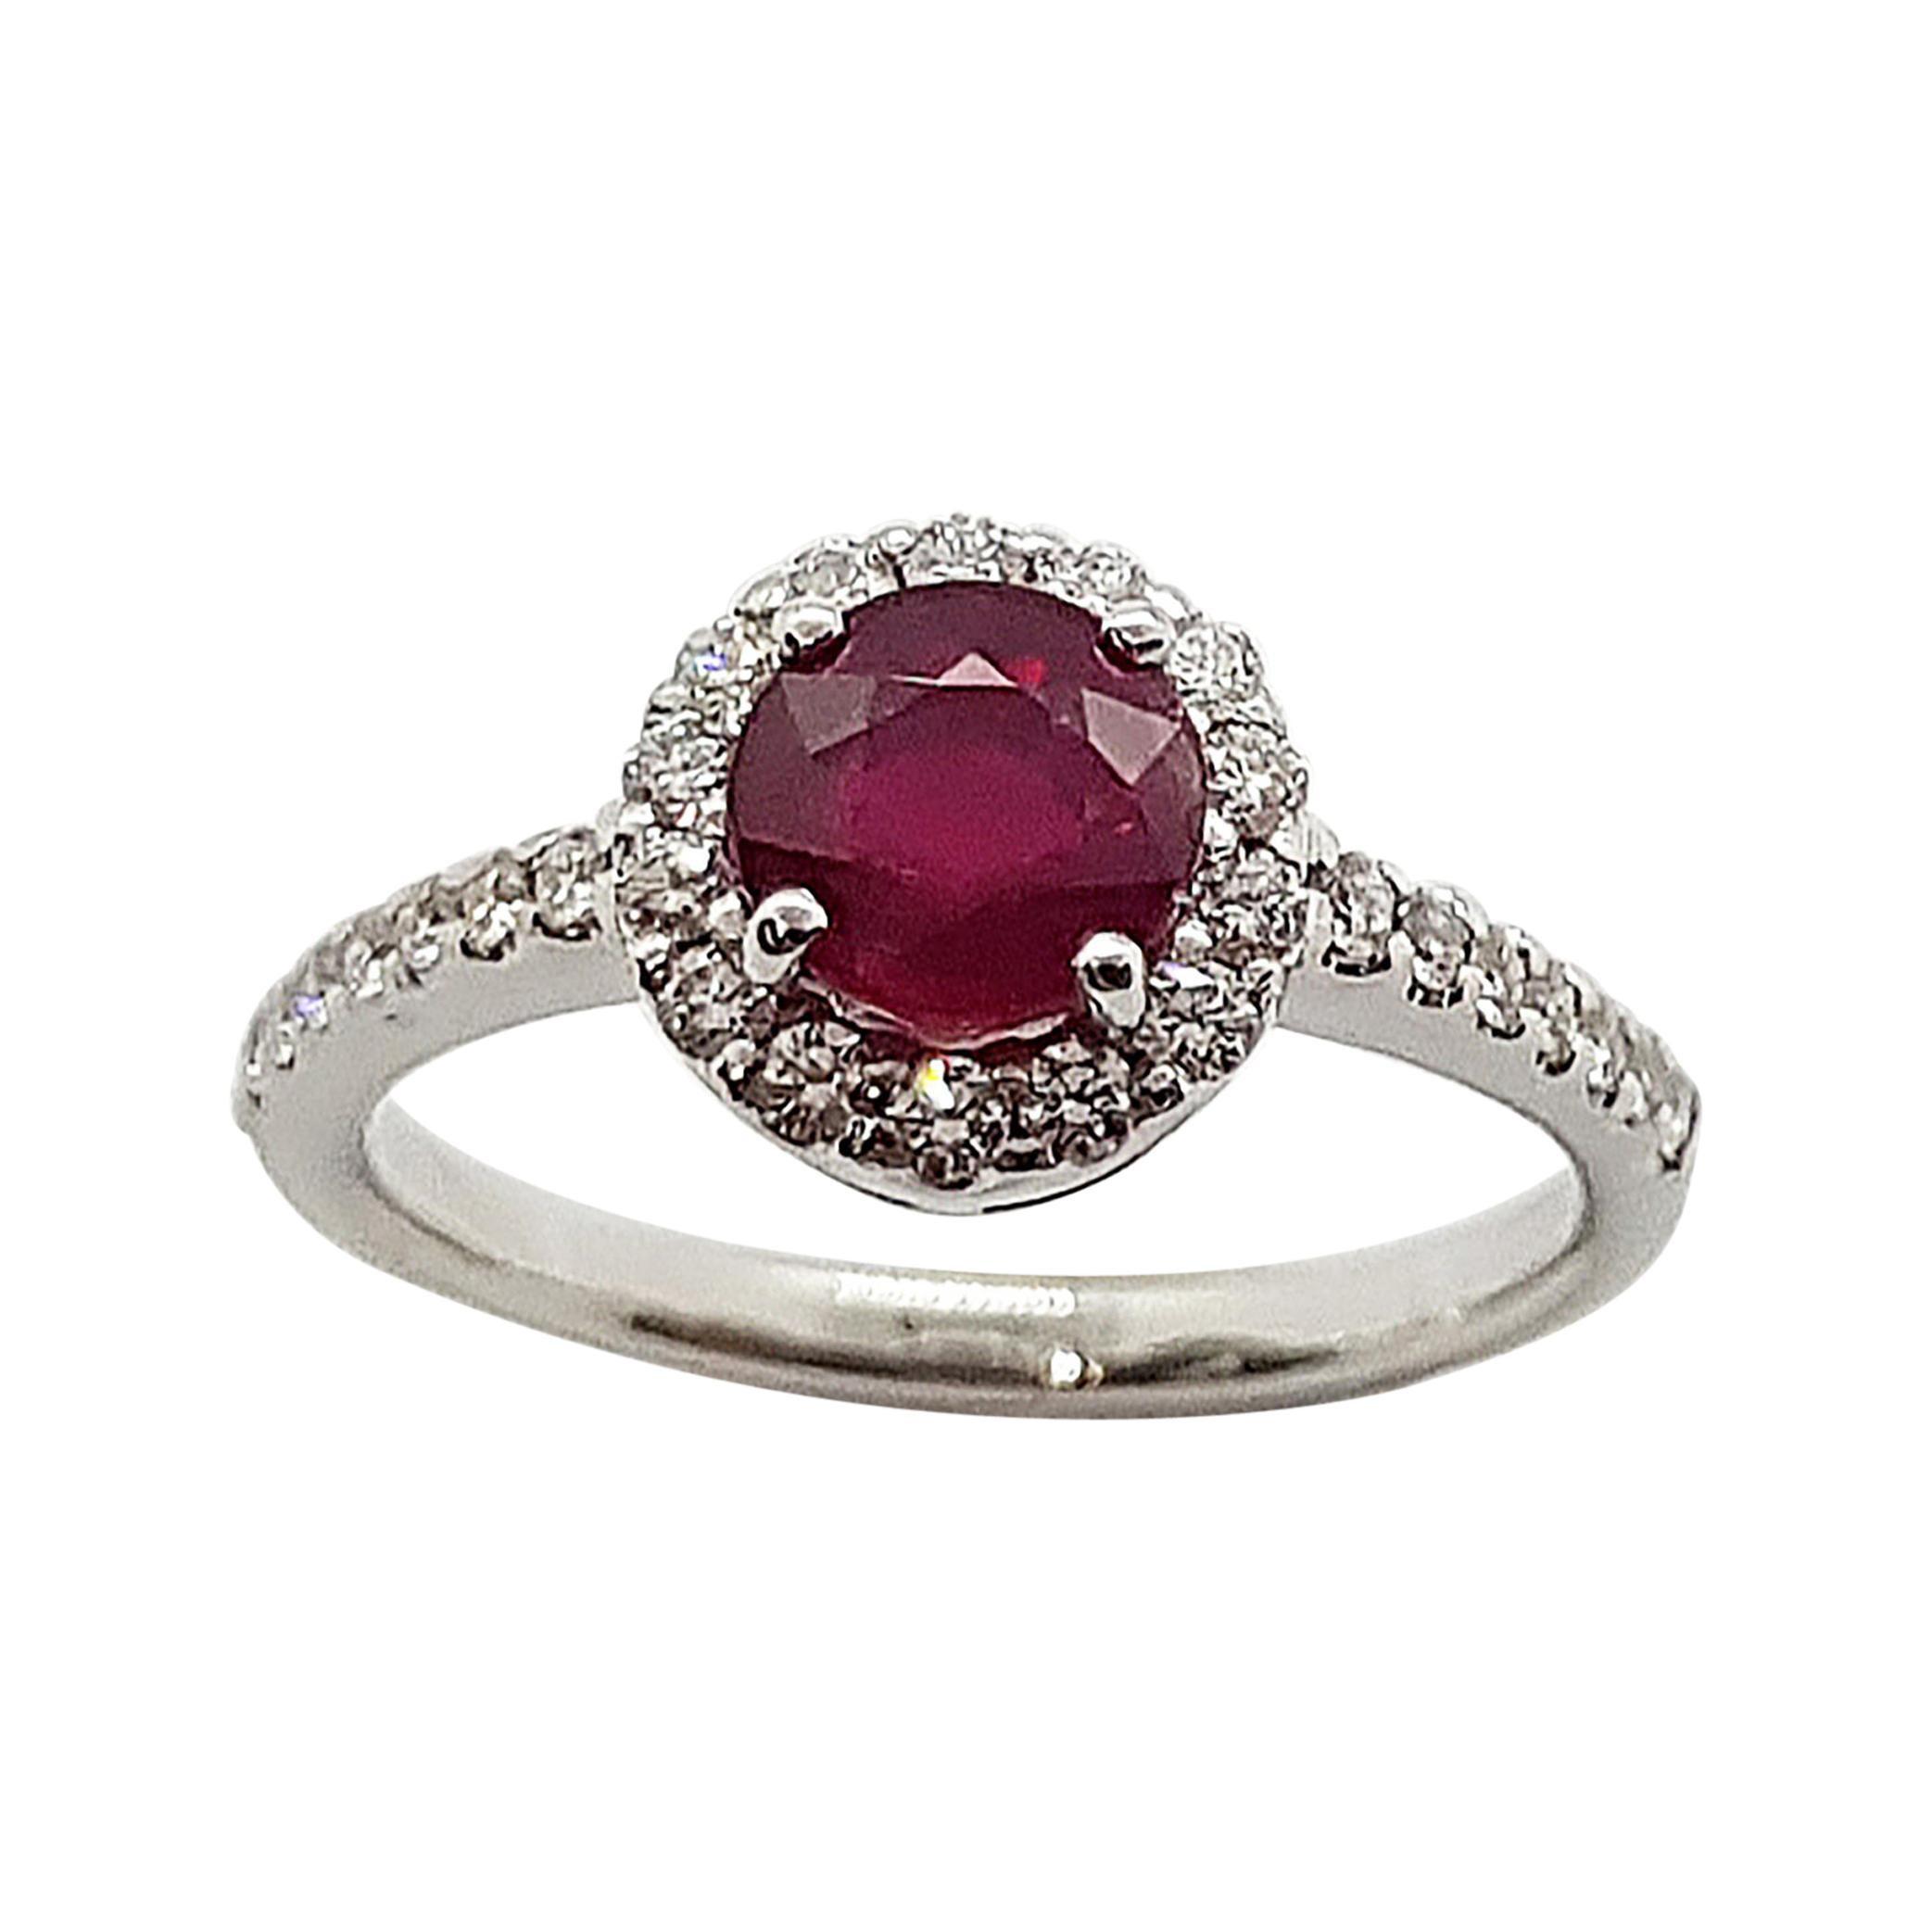 Round Cut Ruby with Diamond Ring Set in 18 Karat White Gold Setting